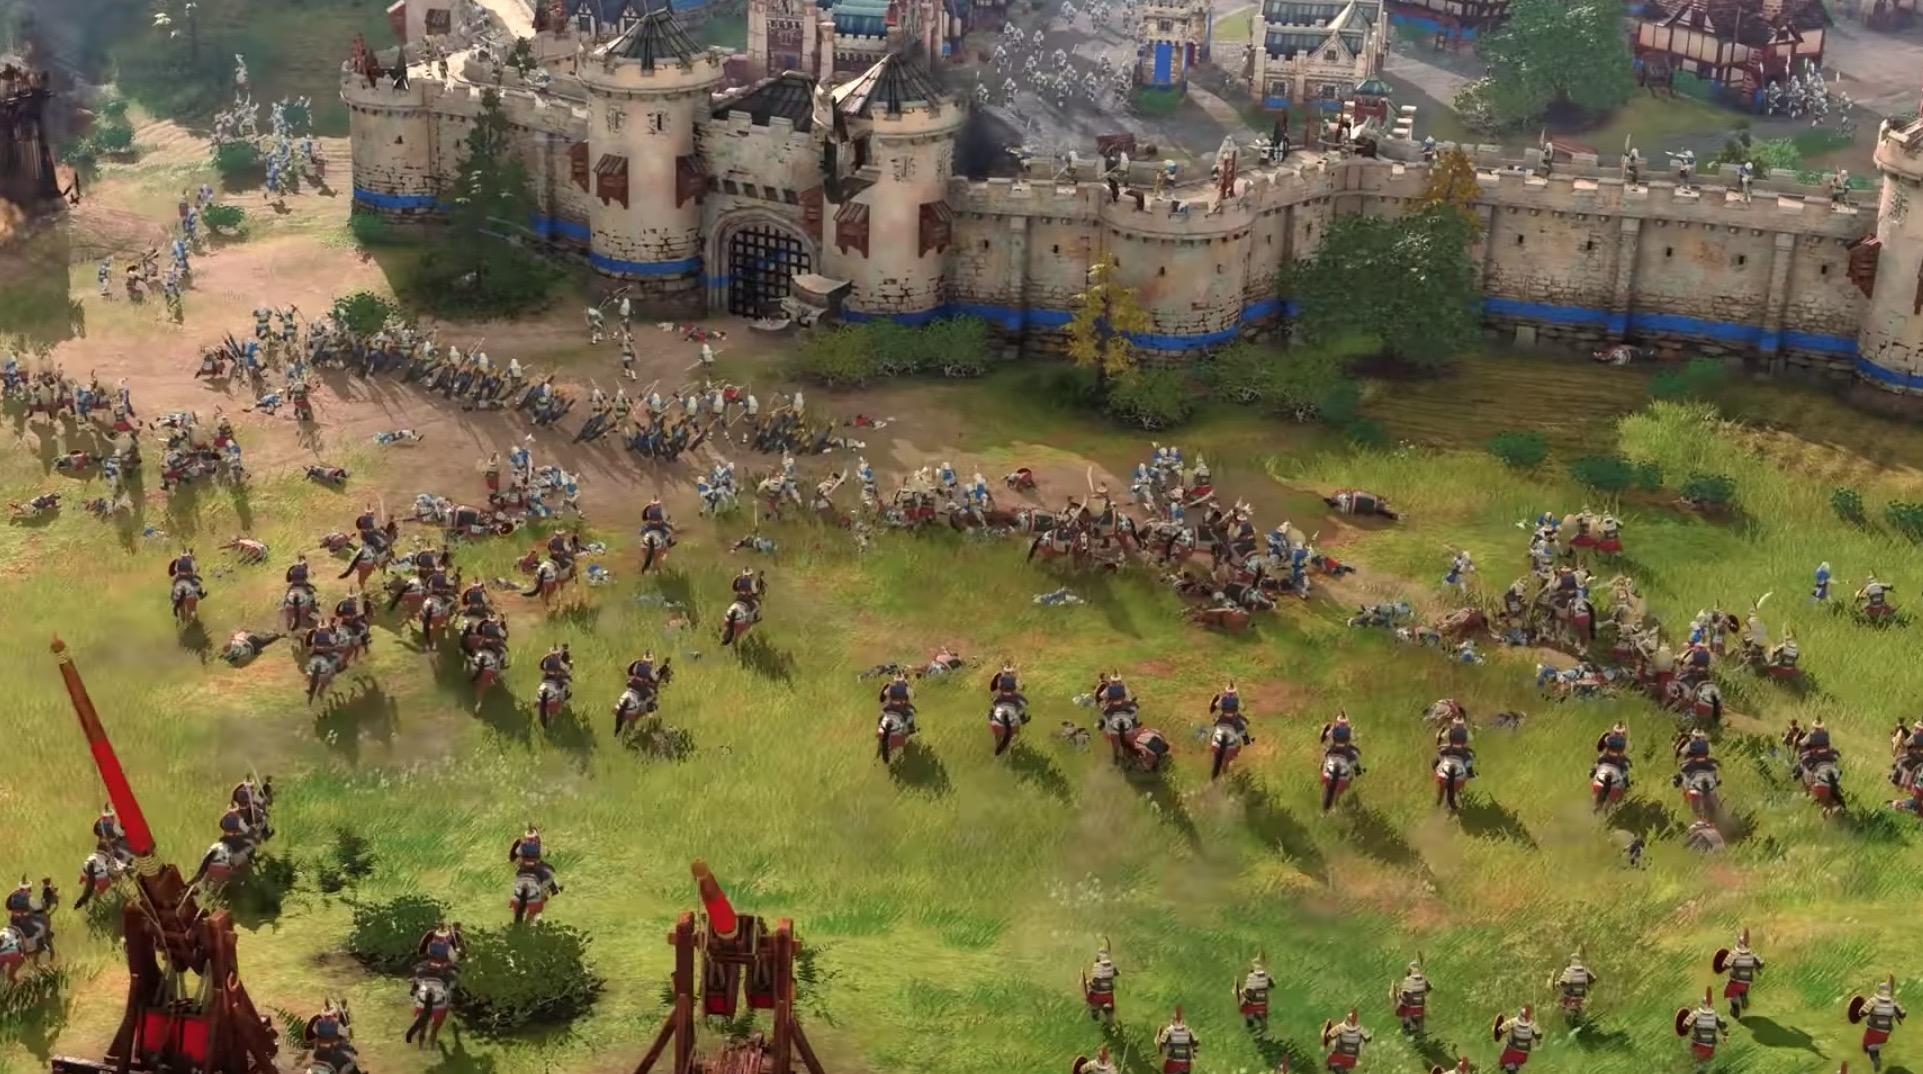 Age of Empires 4 เตรียมวางจำหน่ายอย่างเป็นทางการ 28 ตุลาคม 2021